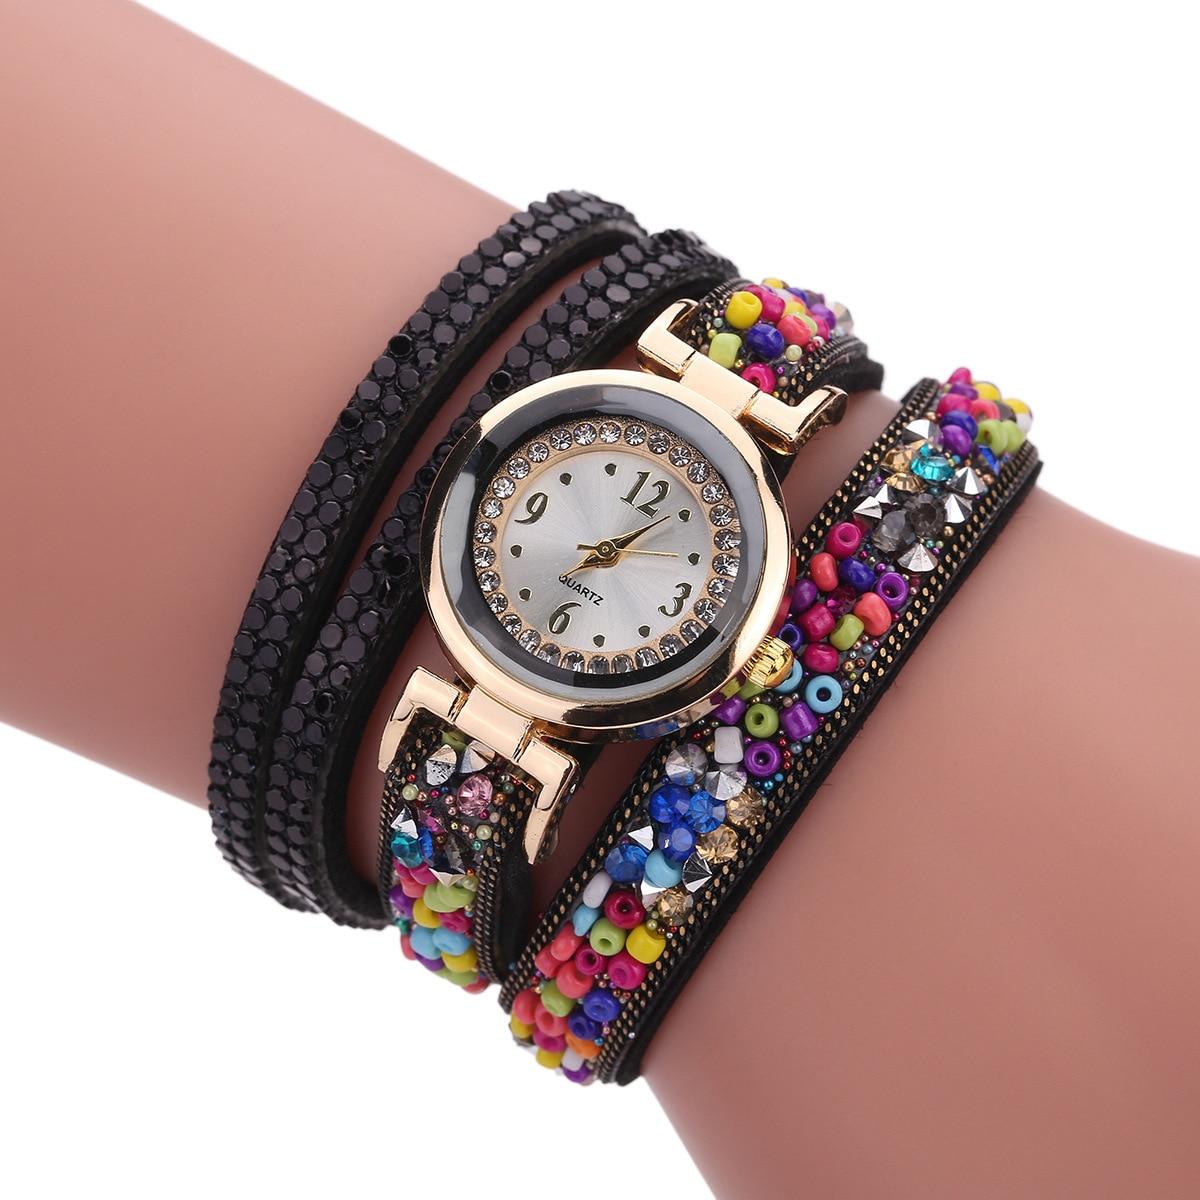 Fashion Luxury Leather Watch Kvinnor Classic Crystal Decor Armband - Damklockor - Foto 2